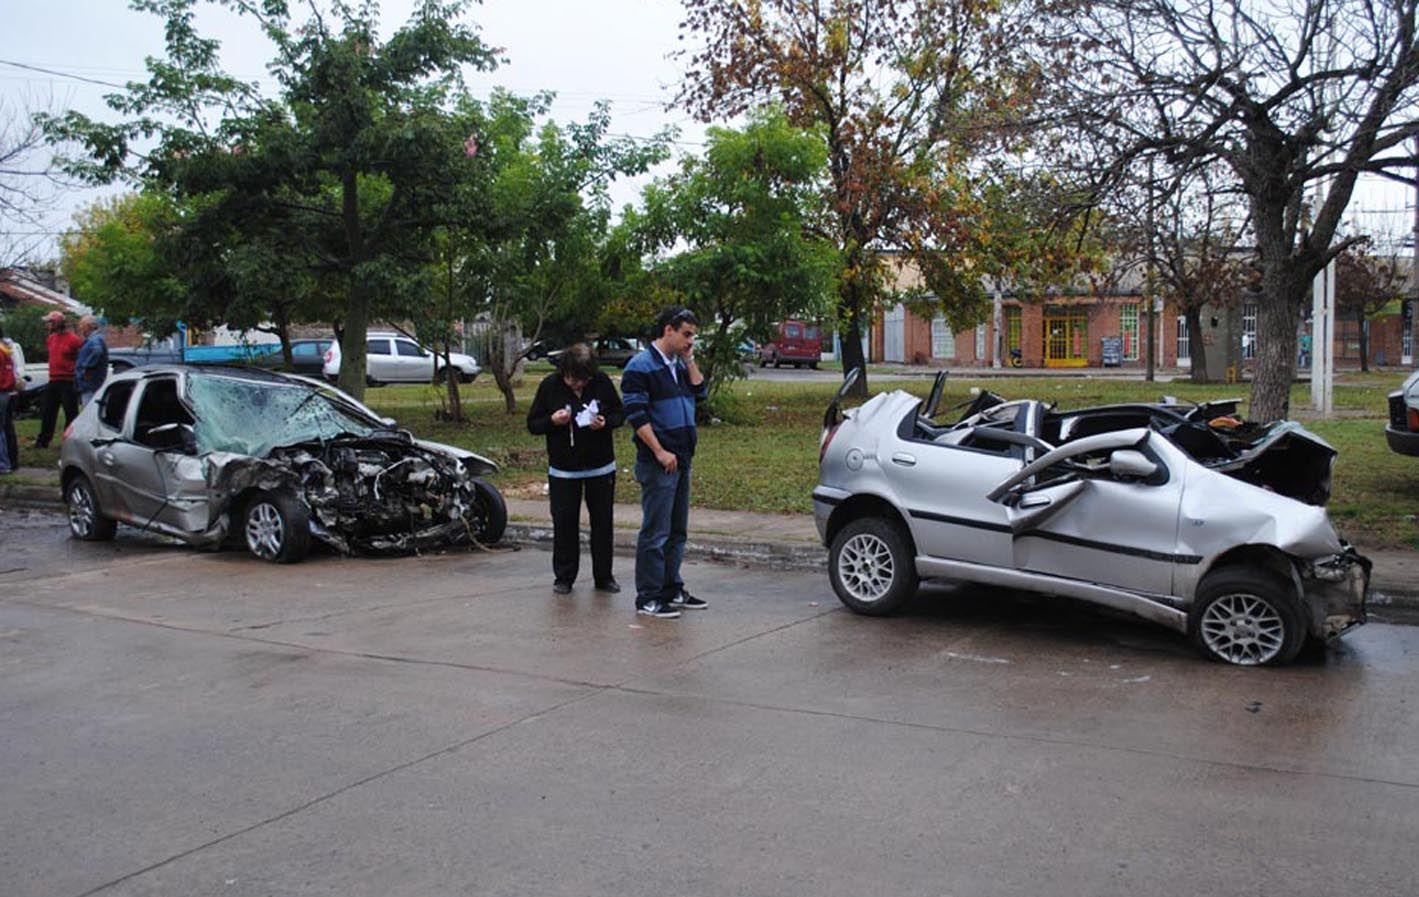 Destrozados. Los dos vehículos que chocaron de frente quedaron prácticamente irreconocibles.